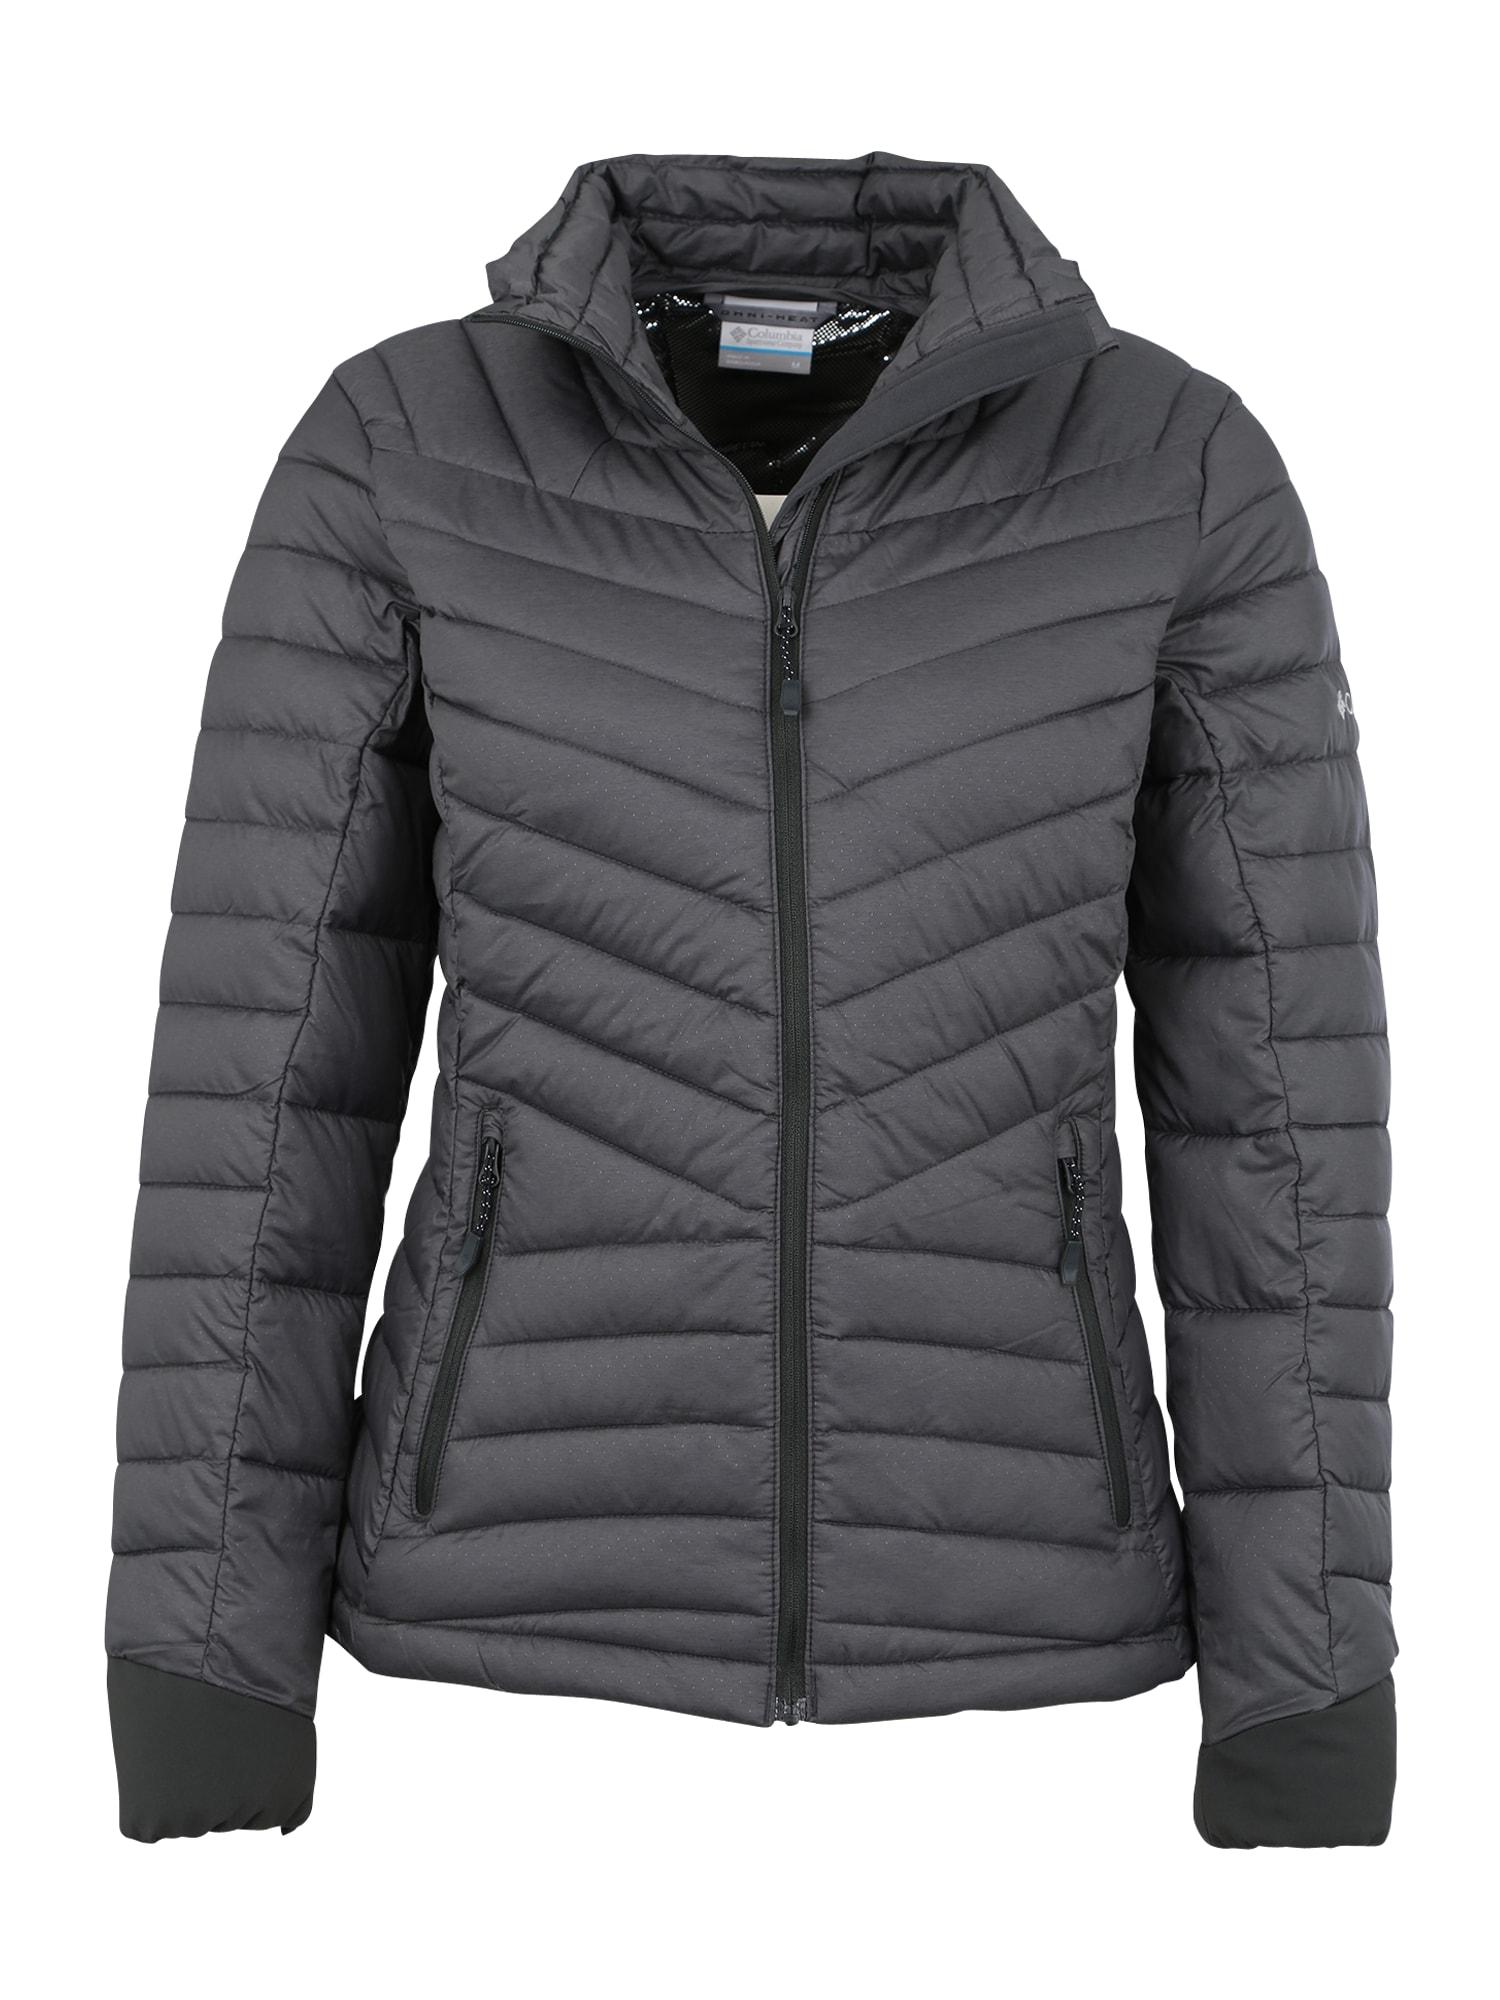 Sport-Jacke 'Windgates Jacket' | Sportbekleidung > Sportjacken > Sonstige Sportjacken | Columbia